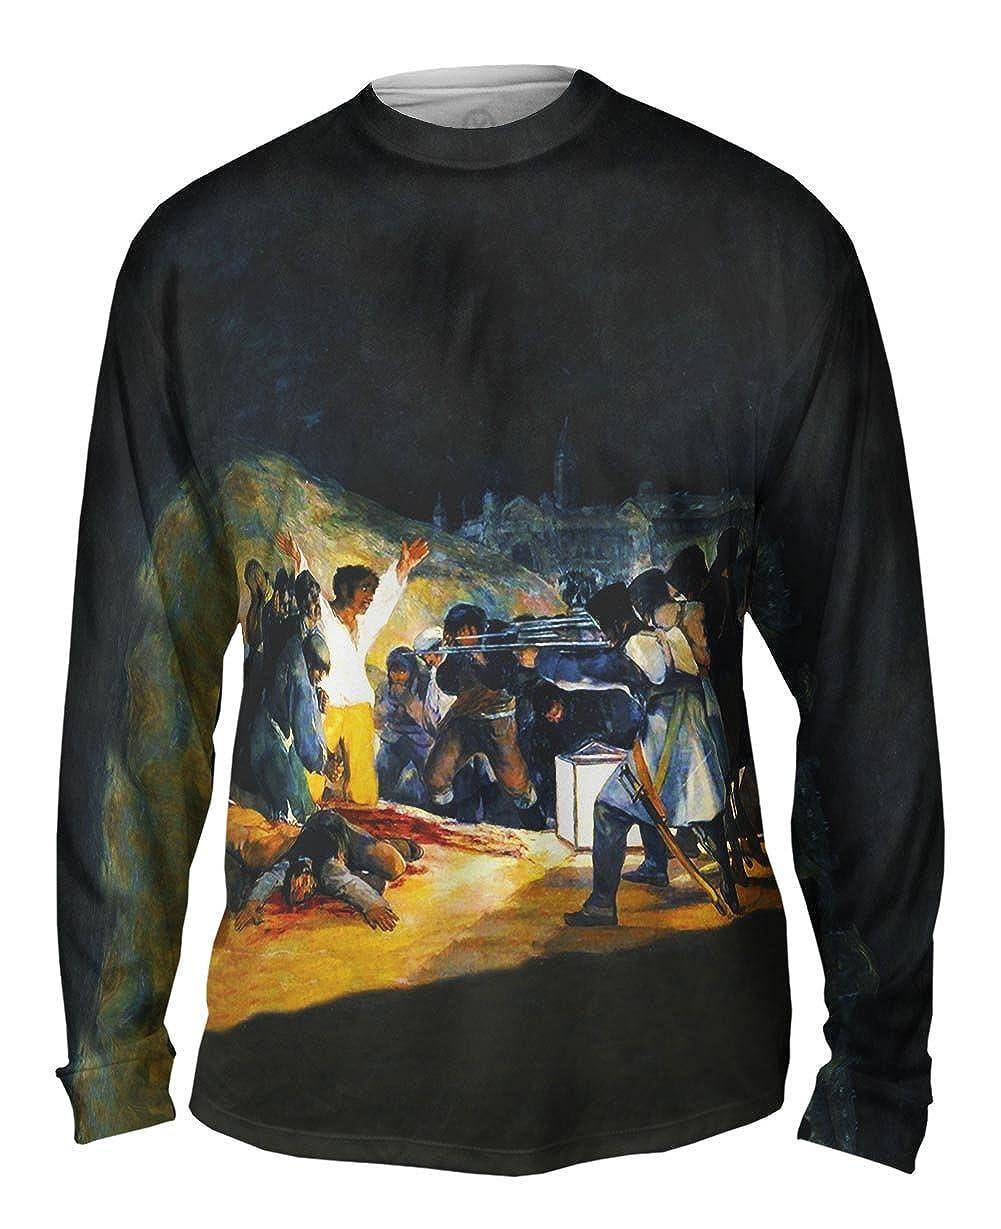 The Third Of May -TShirt- Mens Long Sleeve 1814 Yizzam- Francisco Goya